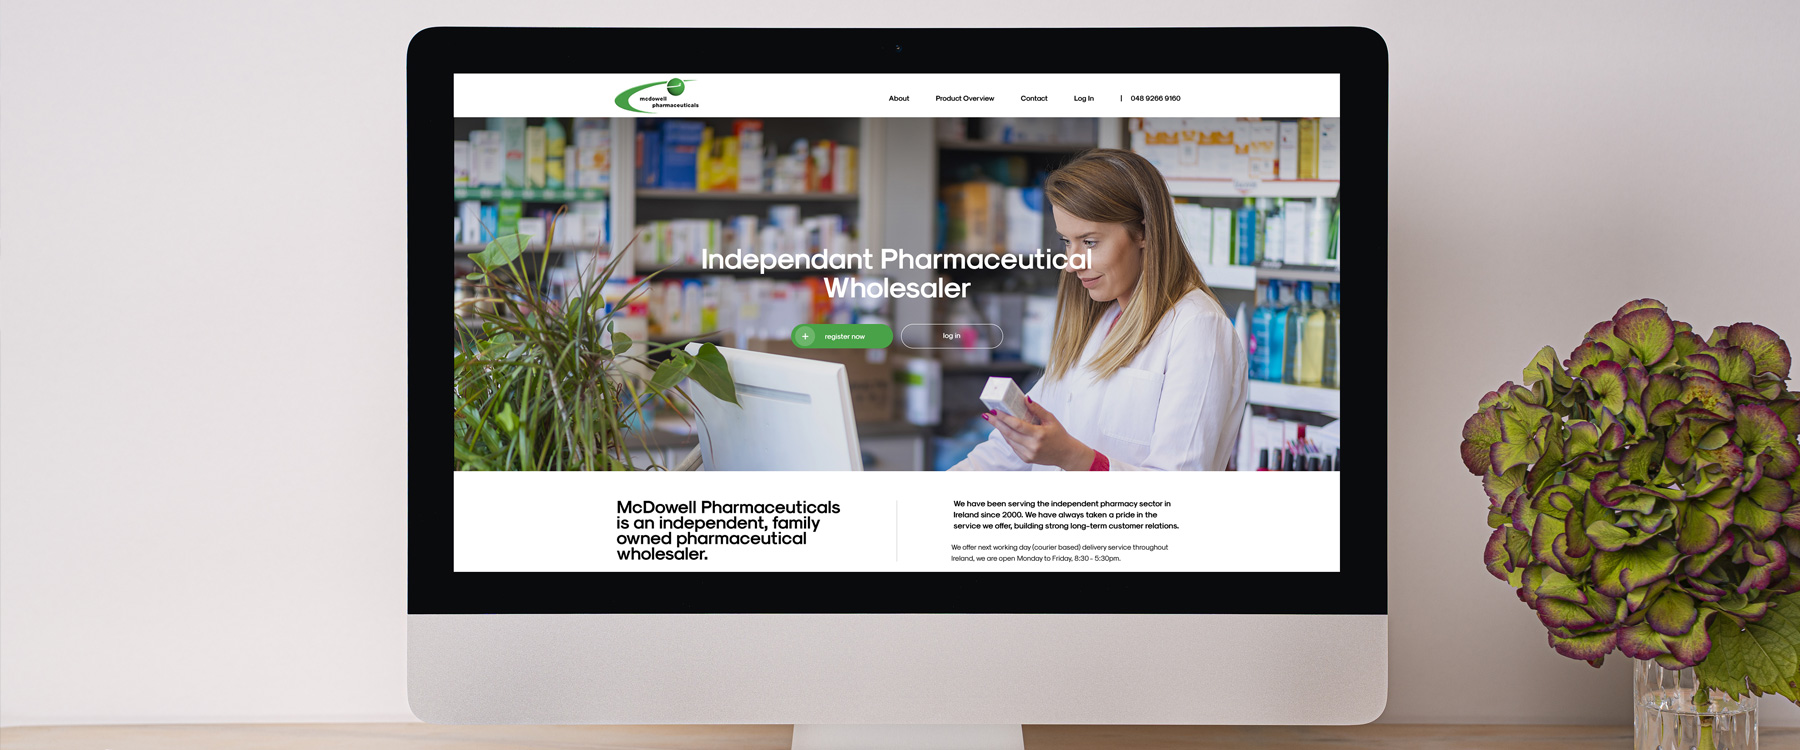 Bespoke new eCommerce Website for McDowell Pharmaceuticals Image